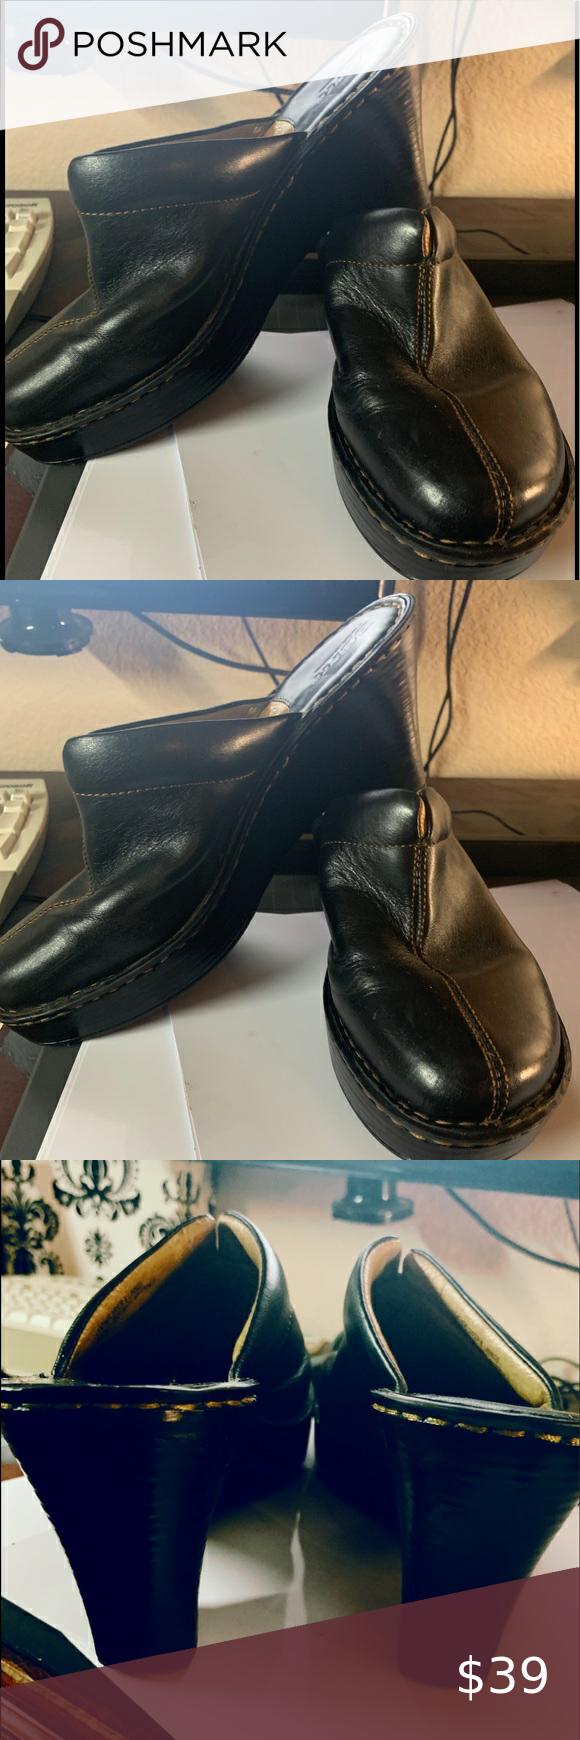 Spotted while shopping on Poshmark: Women's Born Black leather slip on clog, new! #poshmark #fashion #shopping #style #Born #Shoes